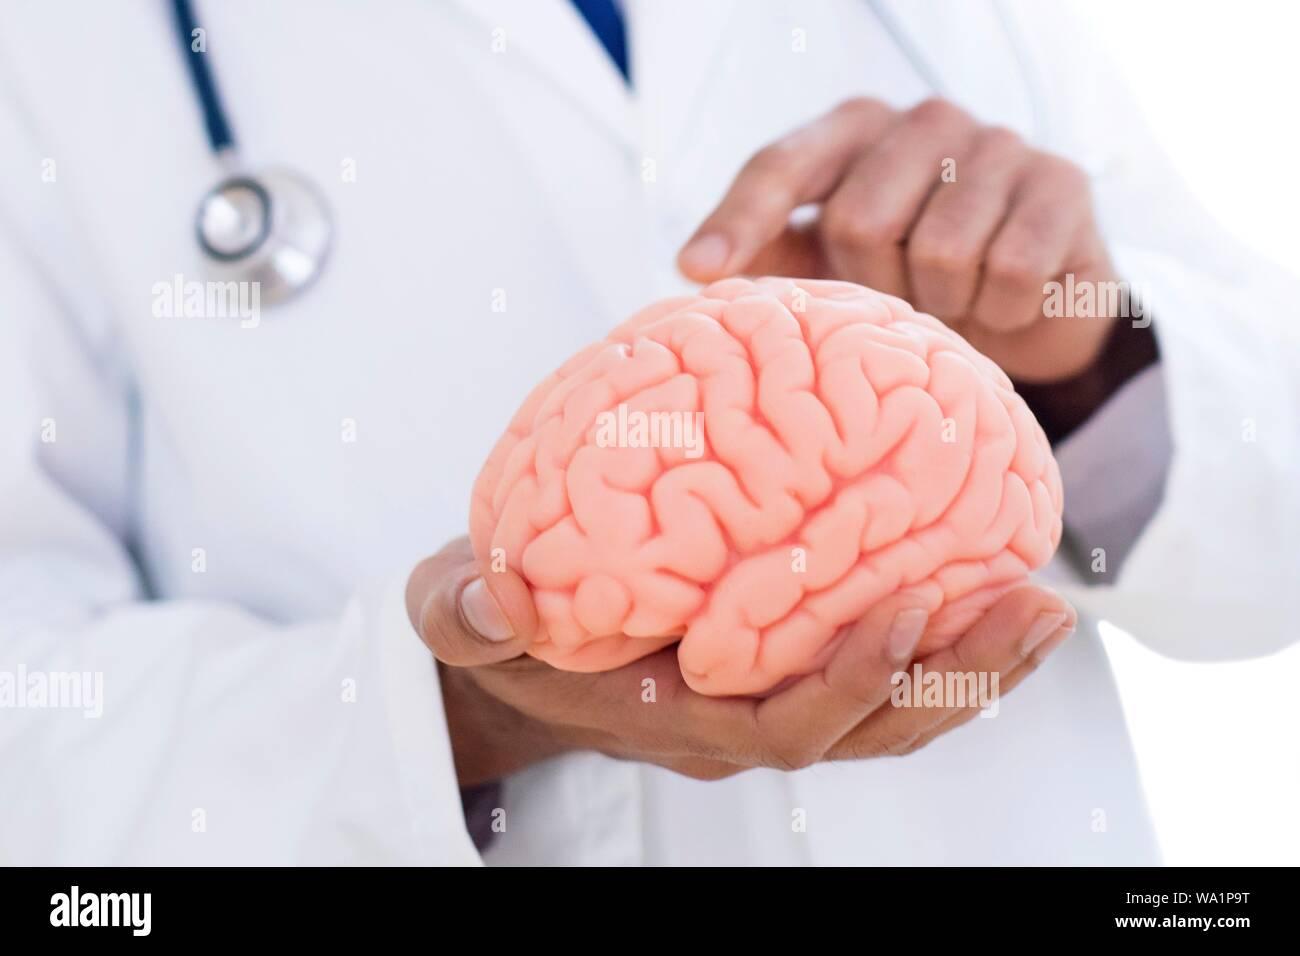 Neurólogo apuntando al cerebro, modelo de cerca. Foto de stock